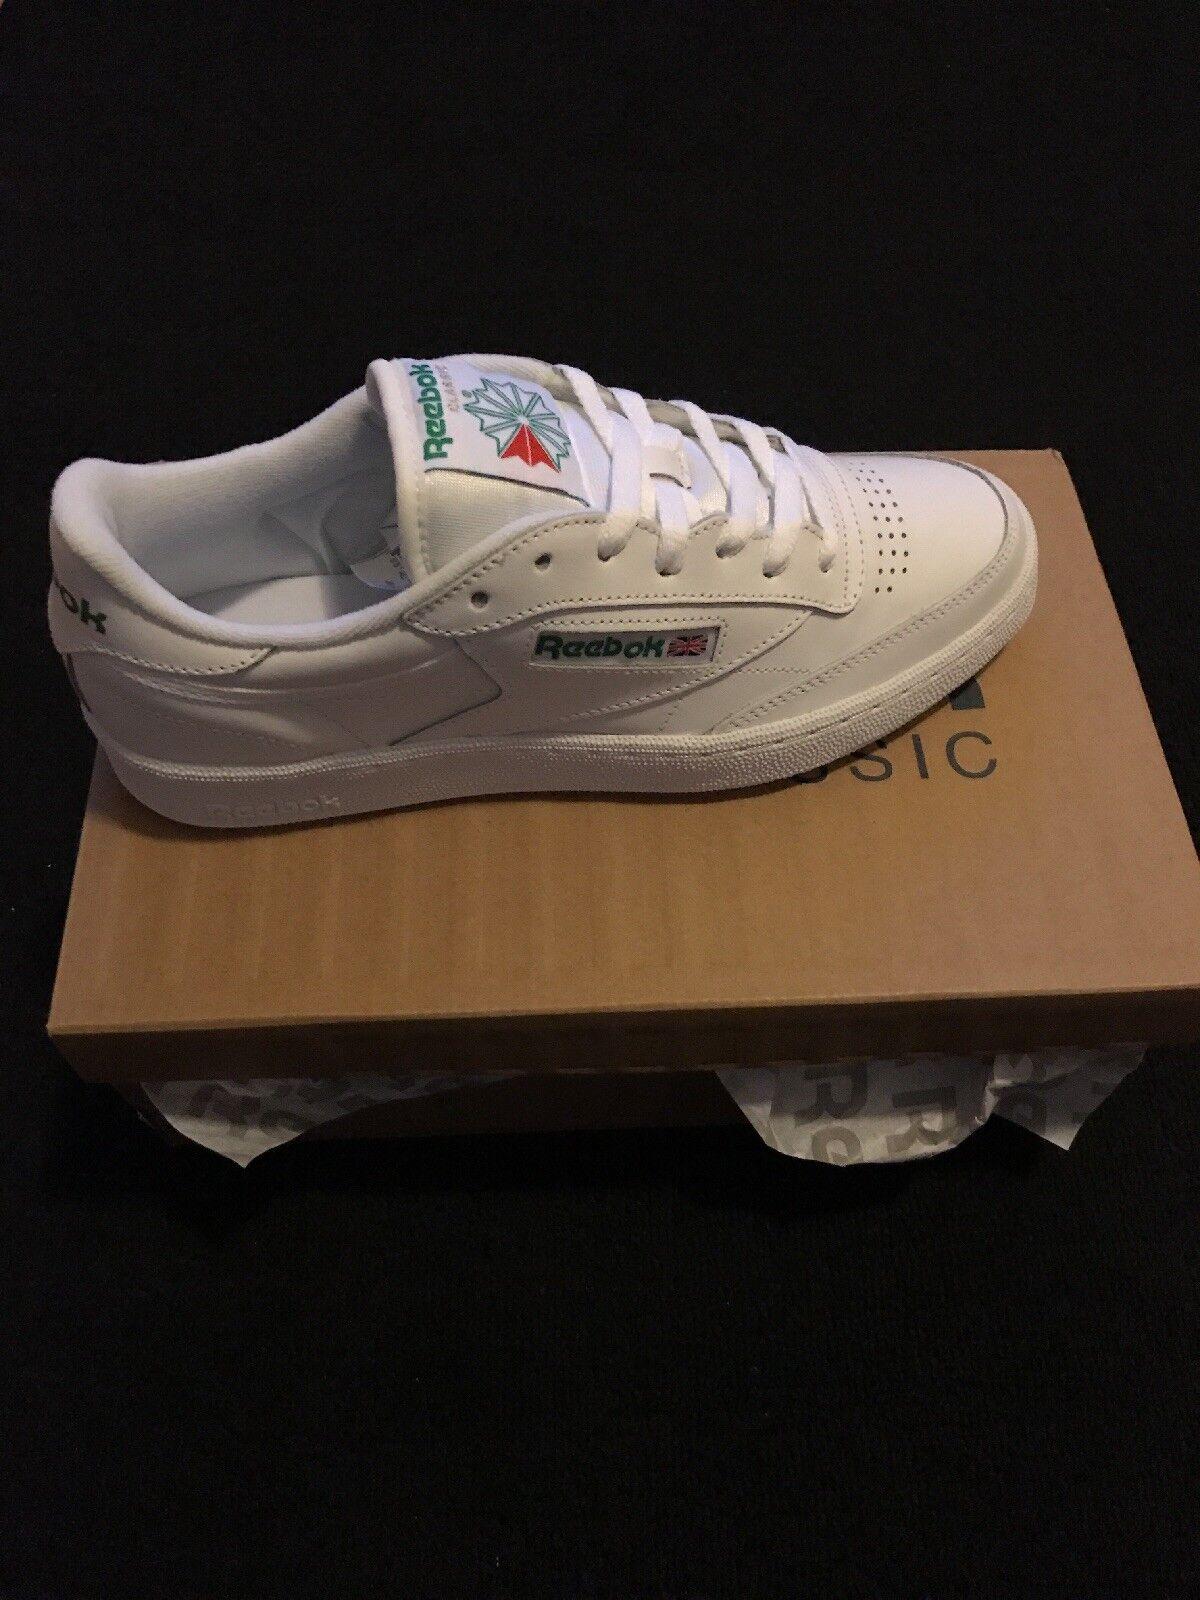 Reebok Classic Men's Tennis shoes Size 9 D Narrow White Leather Exercise